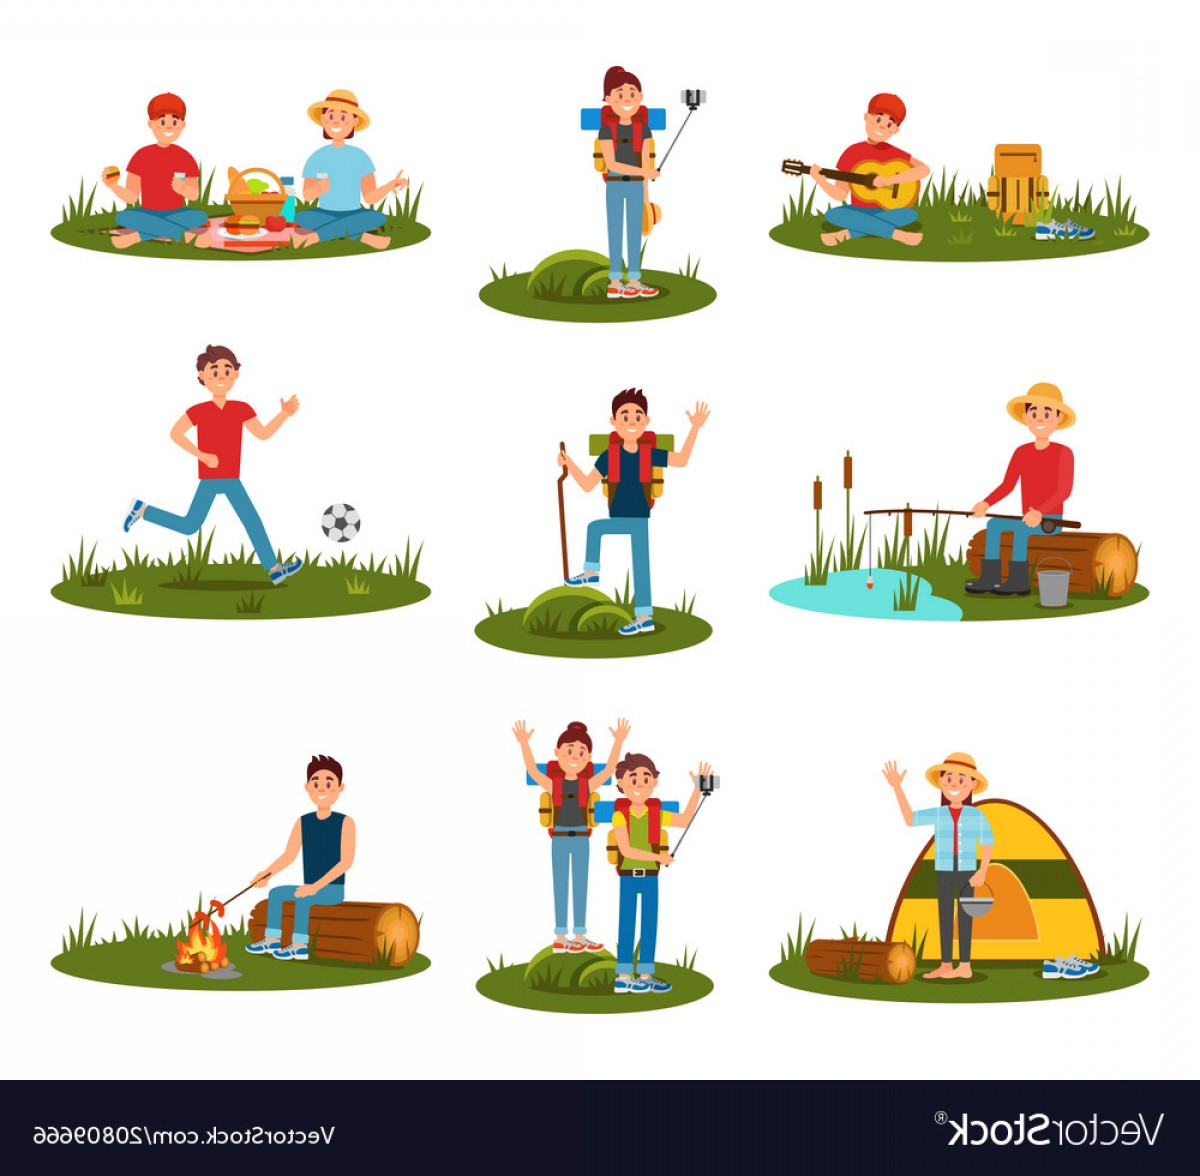 Outdoor recreation clipart image Summer Outdoor Activities Kid Playing Football Vector | SOIDERGI image